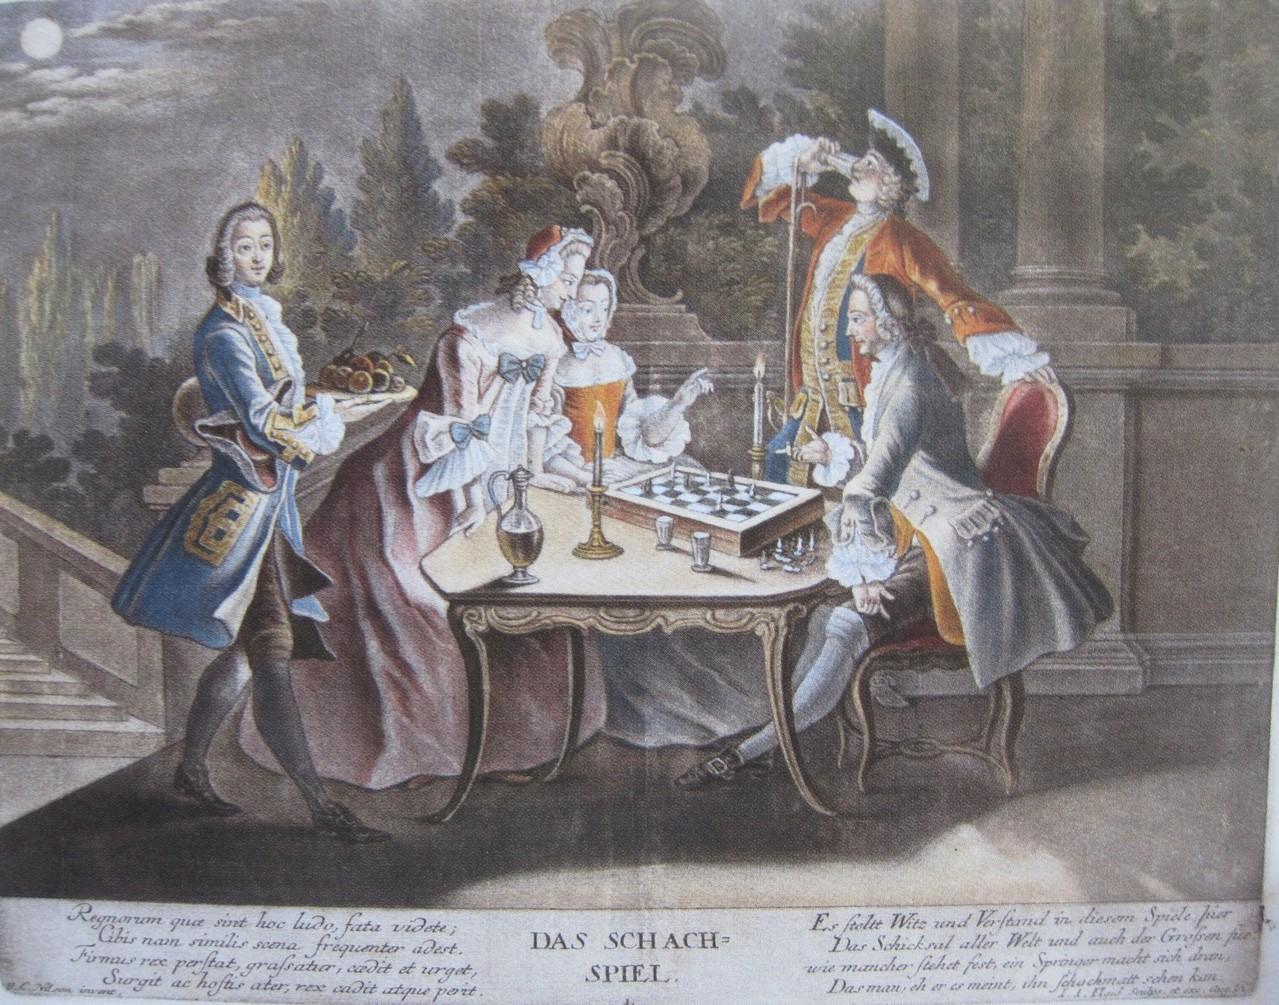 Johann Esaias Nilson 1700 - 1800